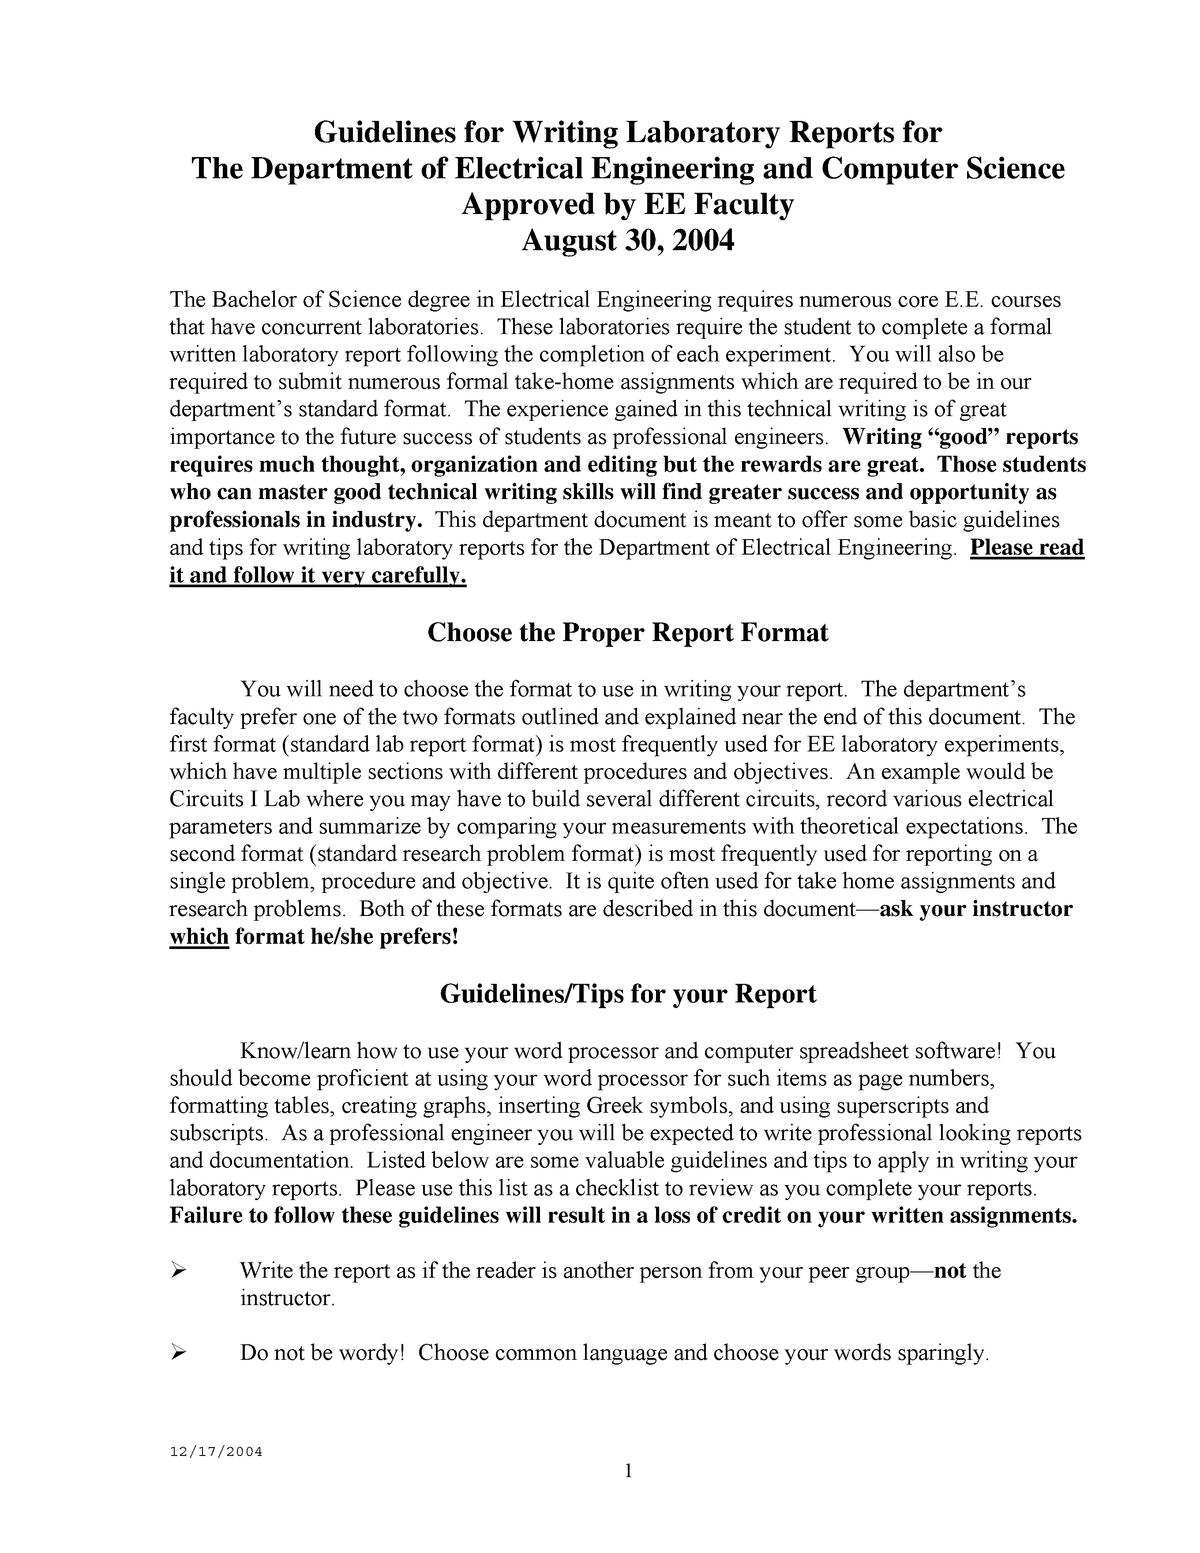 Lab Report Format - Ecte290 - Uow - Studocu With Regard To Engineering Lab Report Template